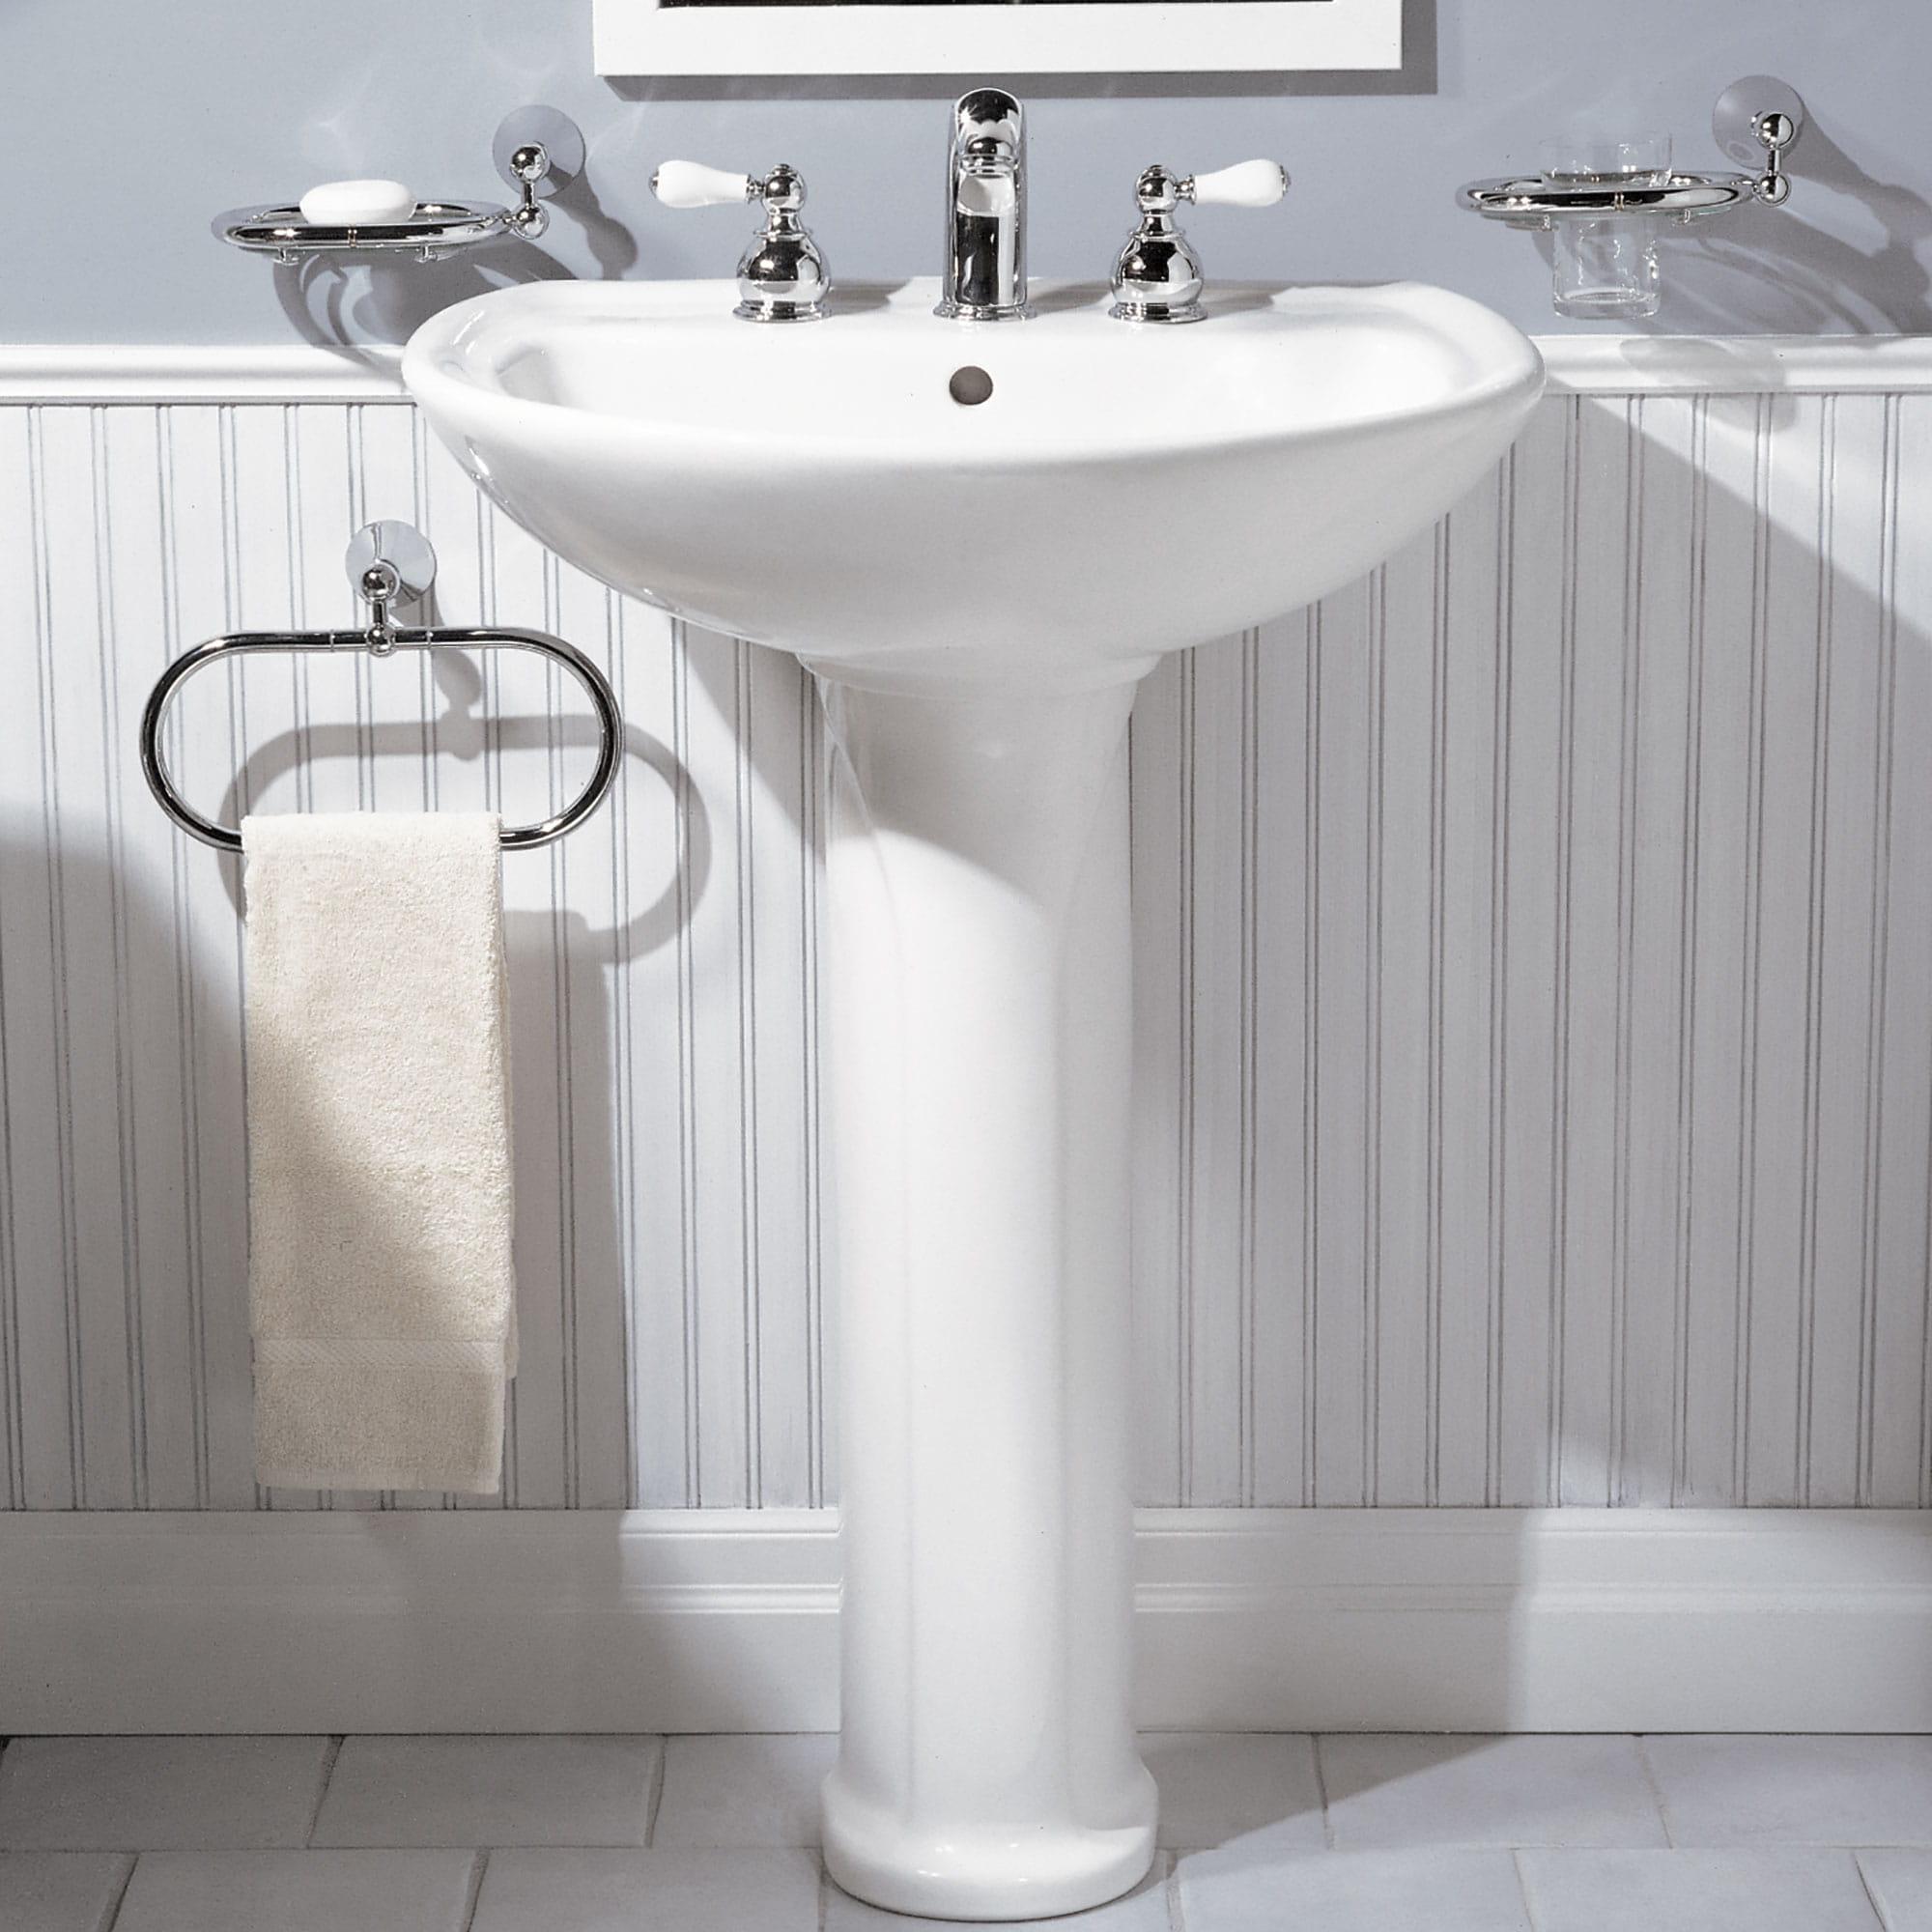 Cadet Bathroom Sink